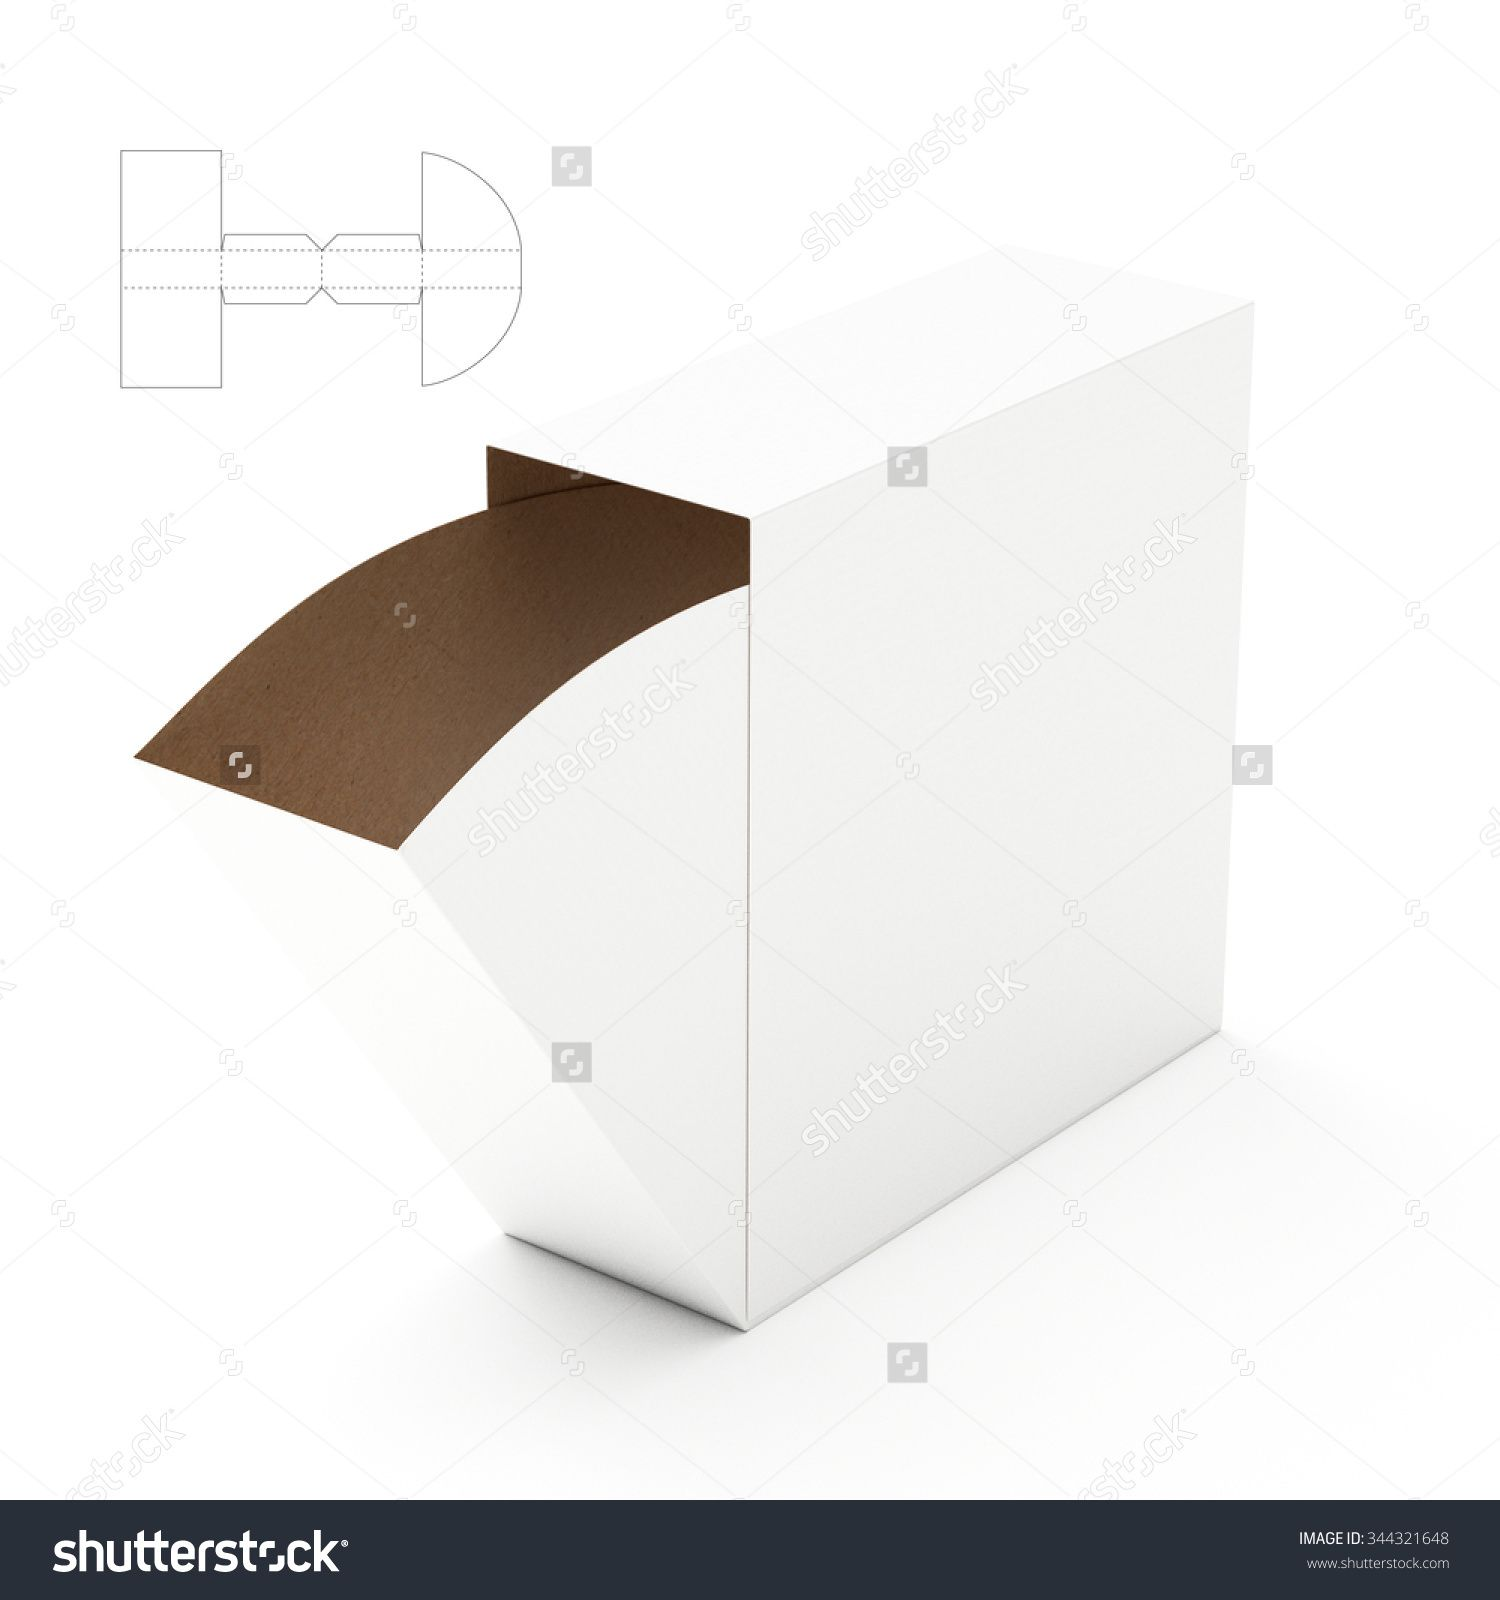 Slim Dispenser Box with Die Cut Template